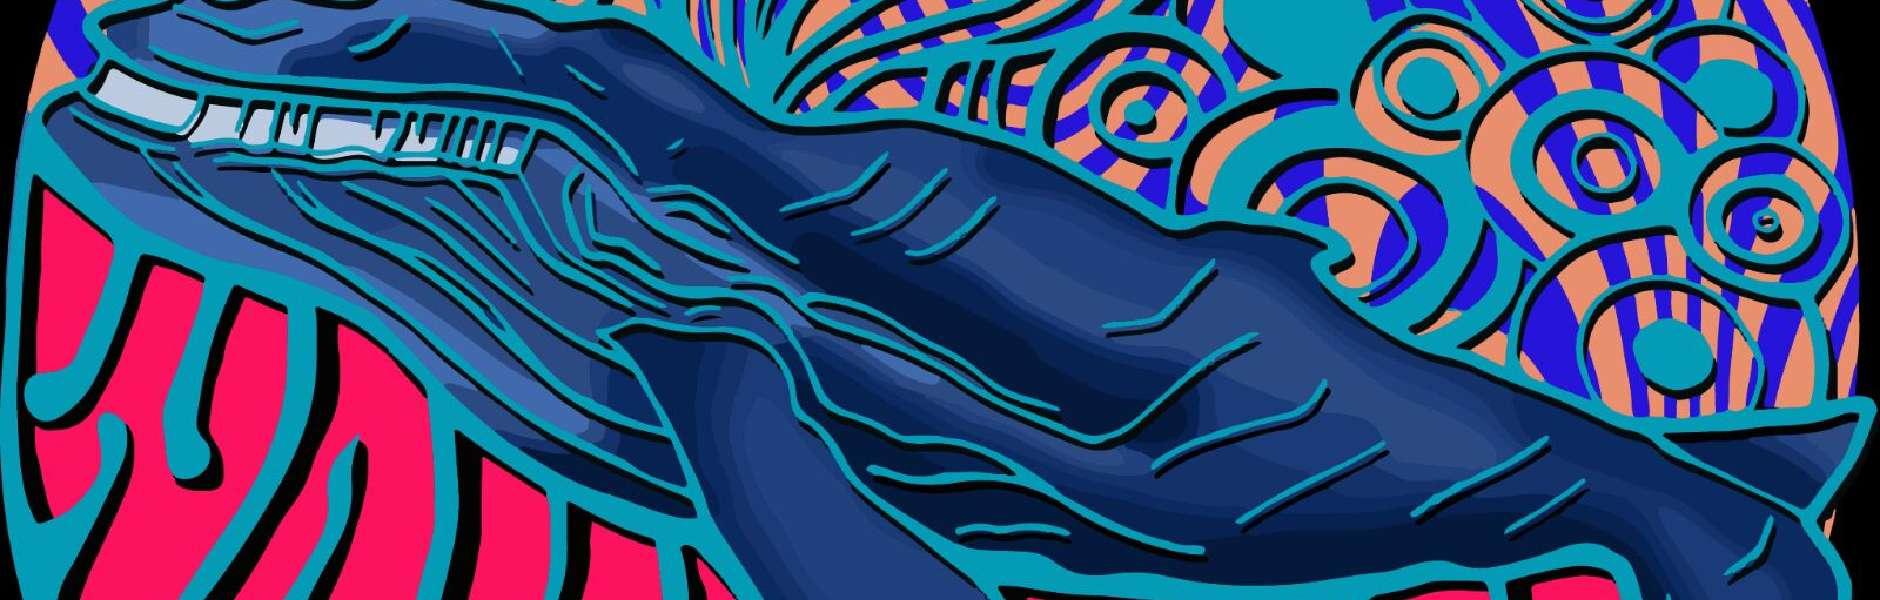 Wallfish